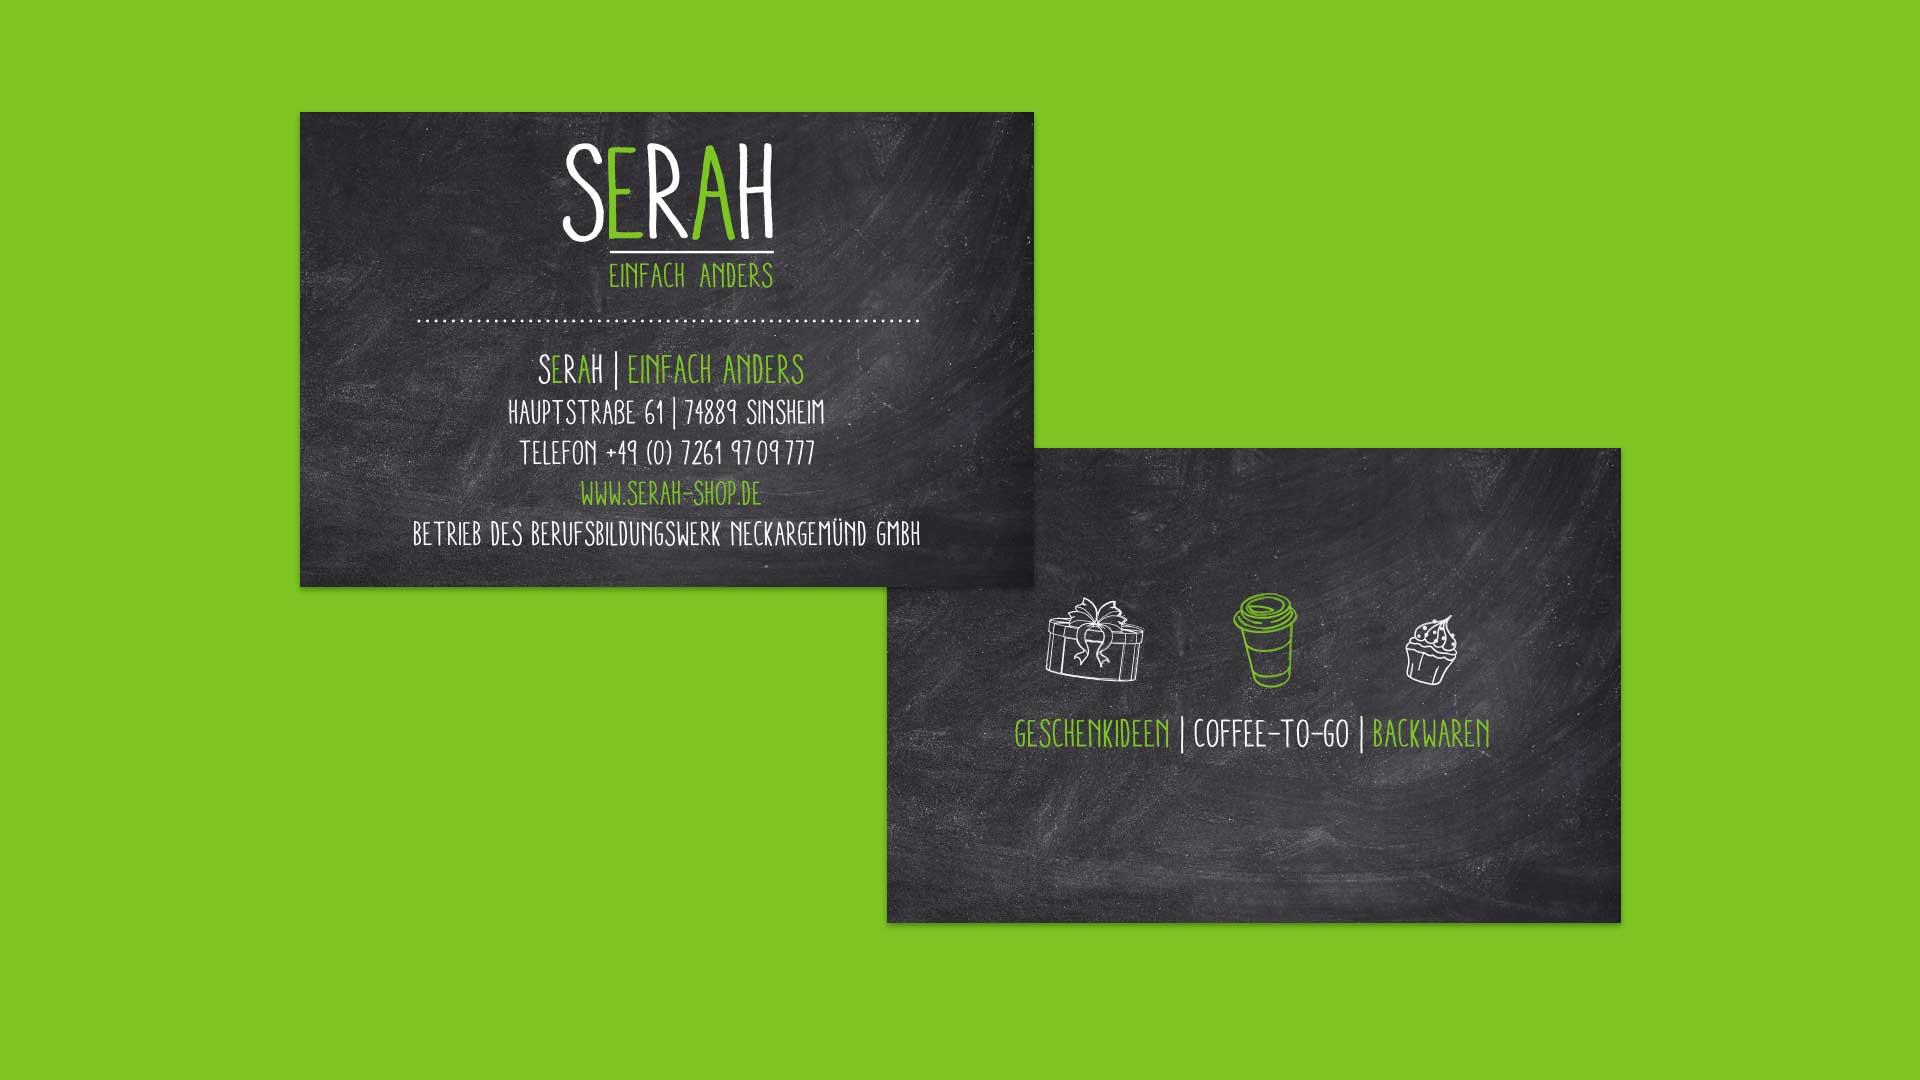 serah_shop_neckargemuend_visitenkarten